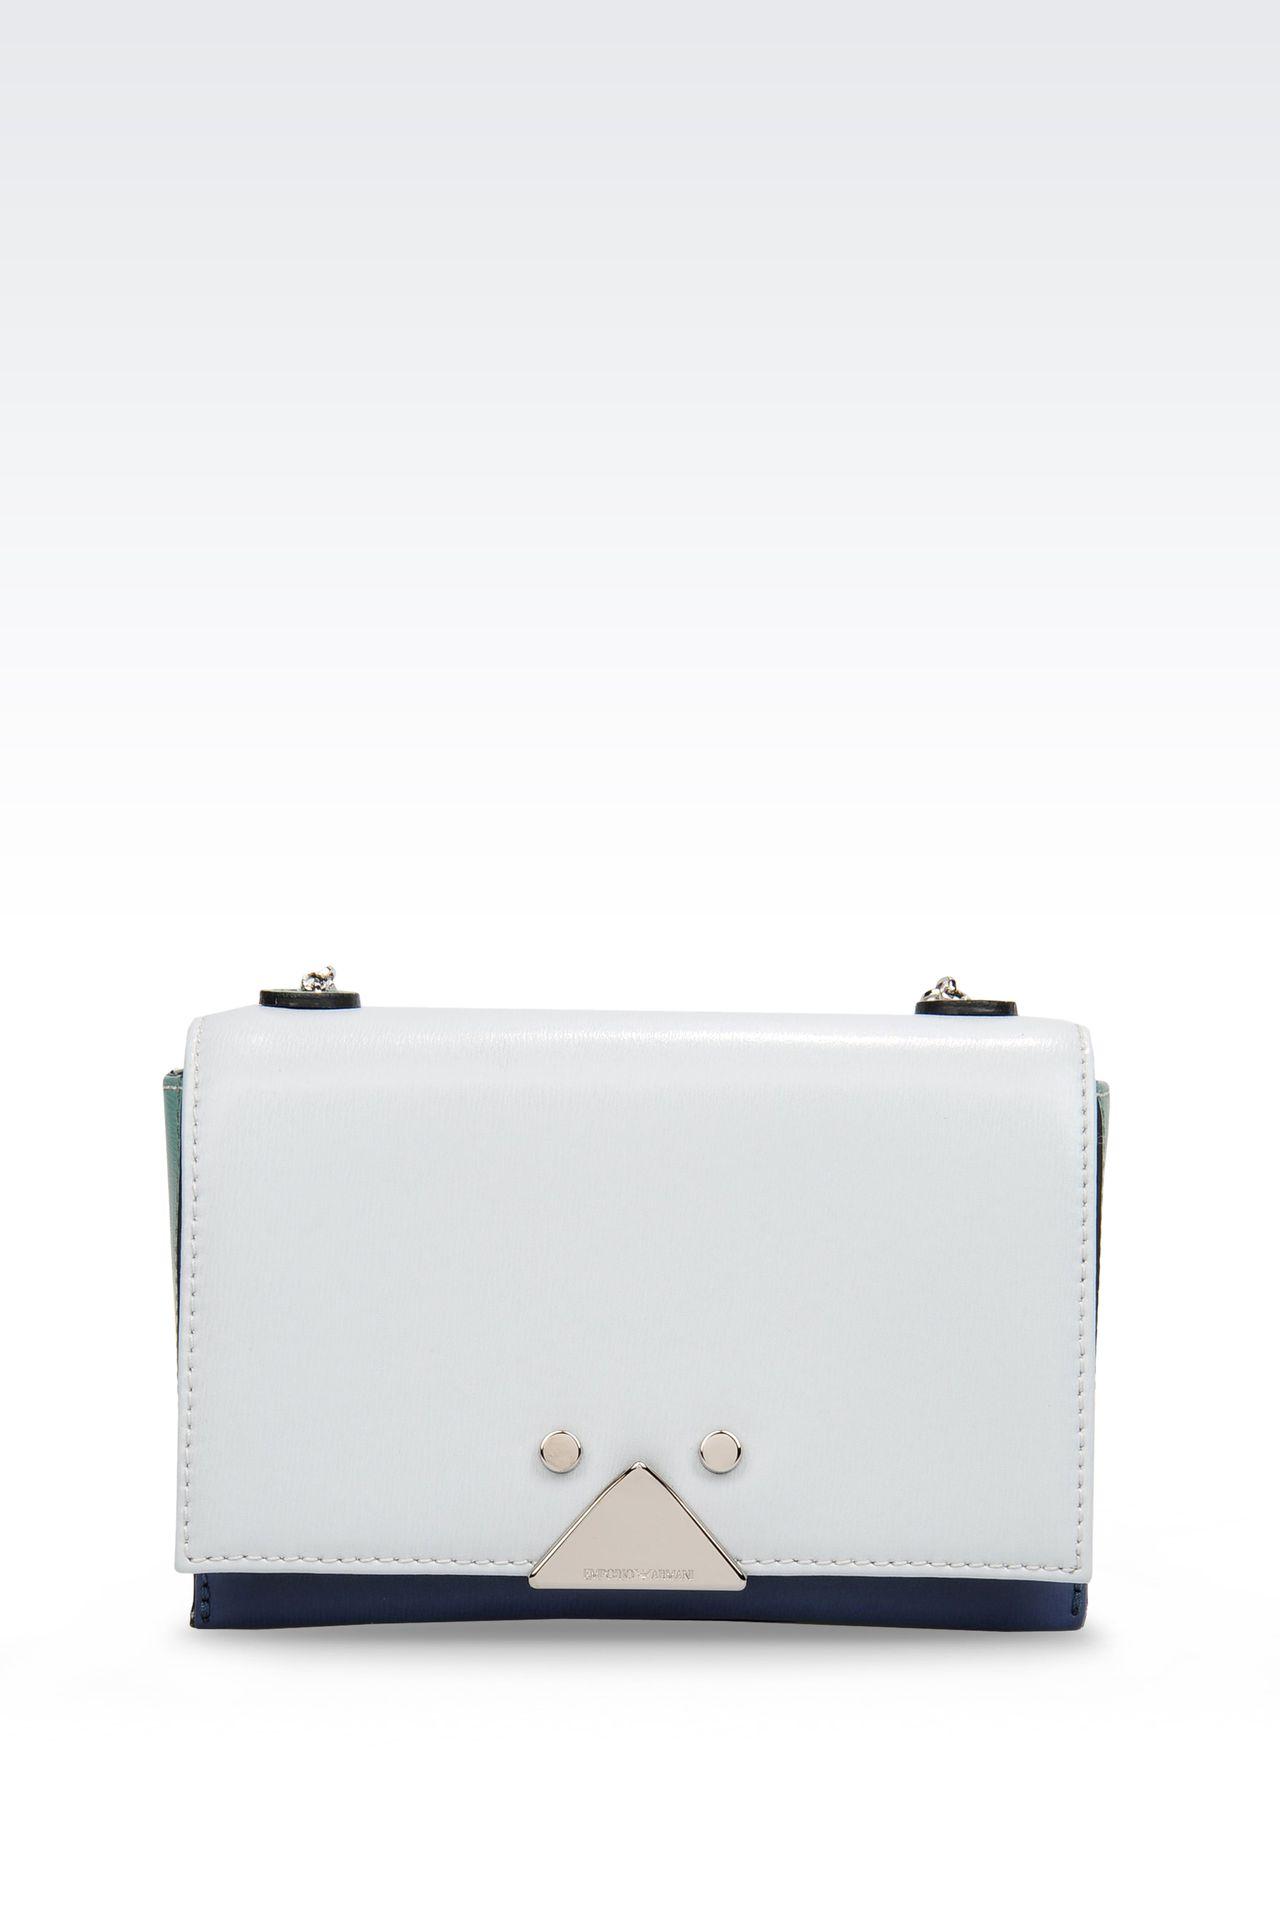 Emporio Armani Women Messenger Bag - SMALL BOARDED CALFSKIN BAG WITH CHAIN SHOULDER STRAP Emporio Armani Official Online Store